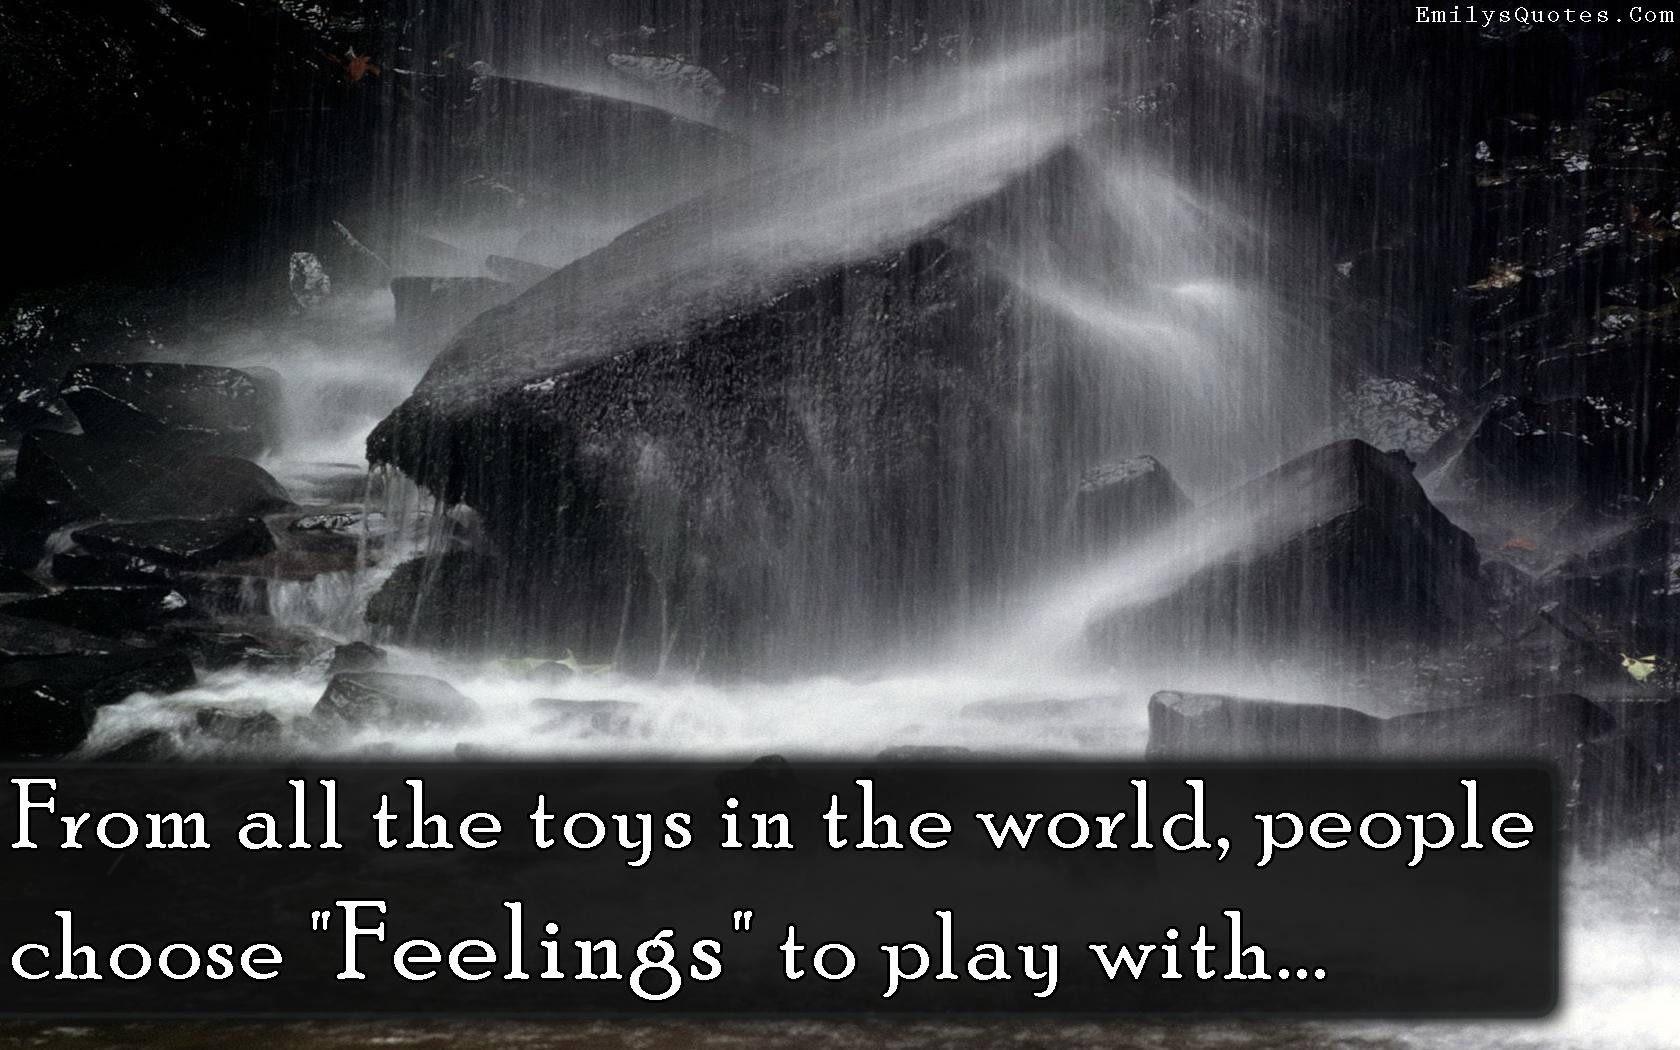 EmilysQuotes.Com - unknown, toys people, feelings, play, sad, negative